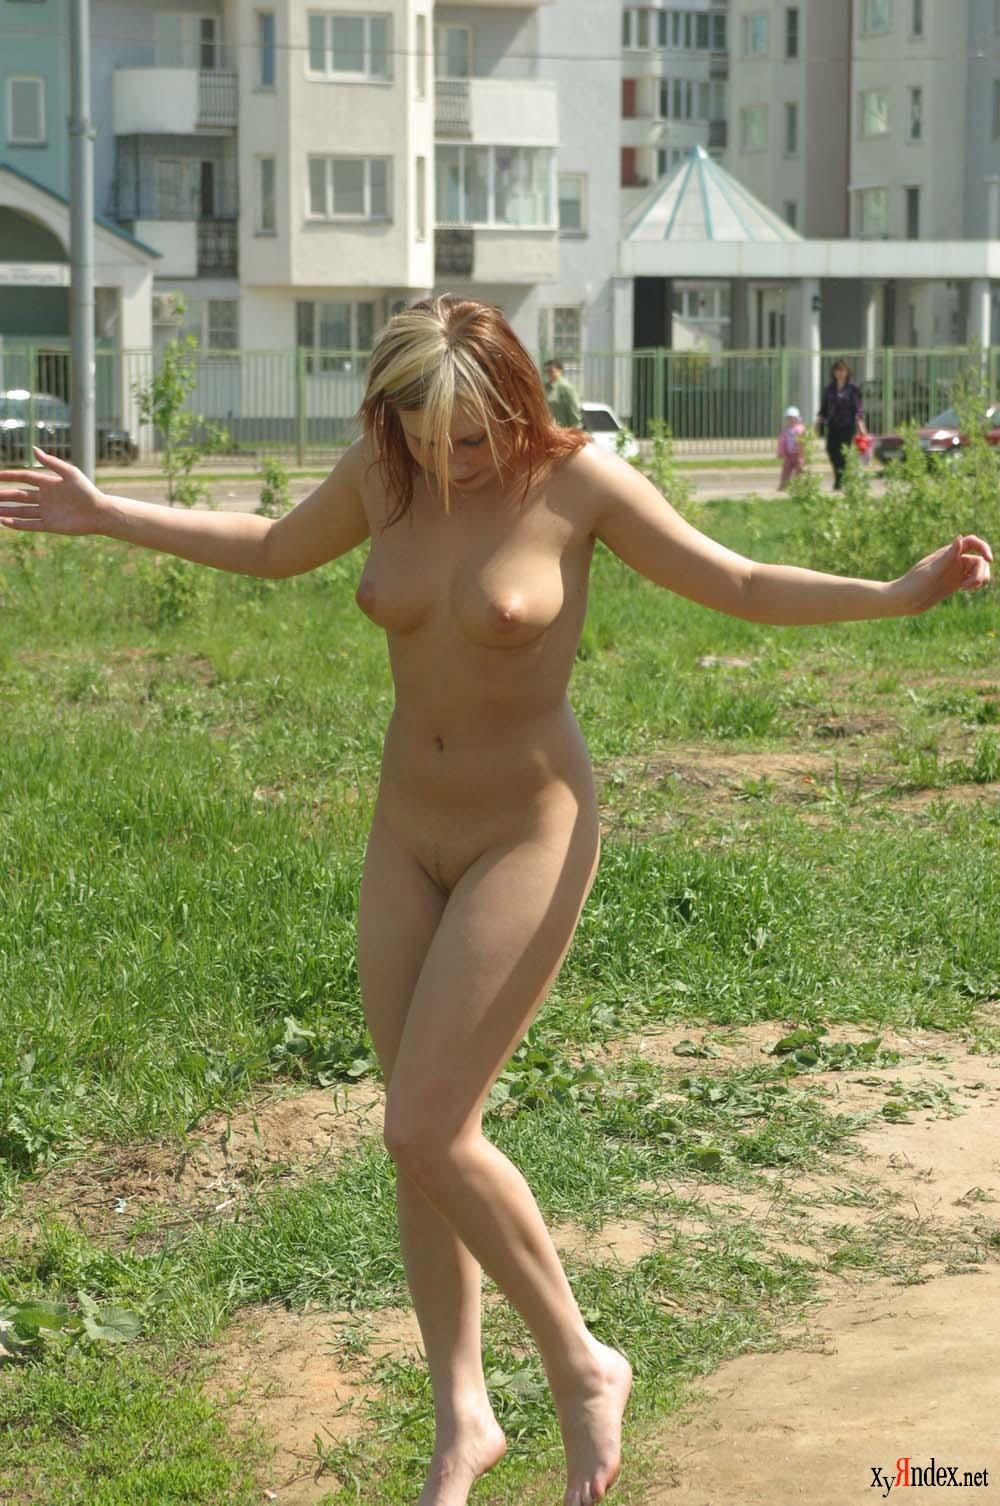 MILF  Порно секс фото бесплатно Страница 2